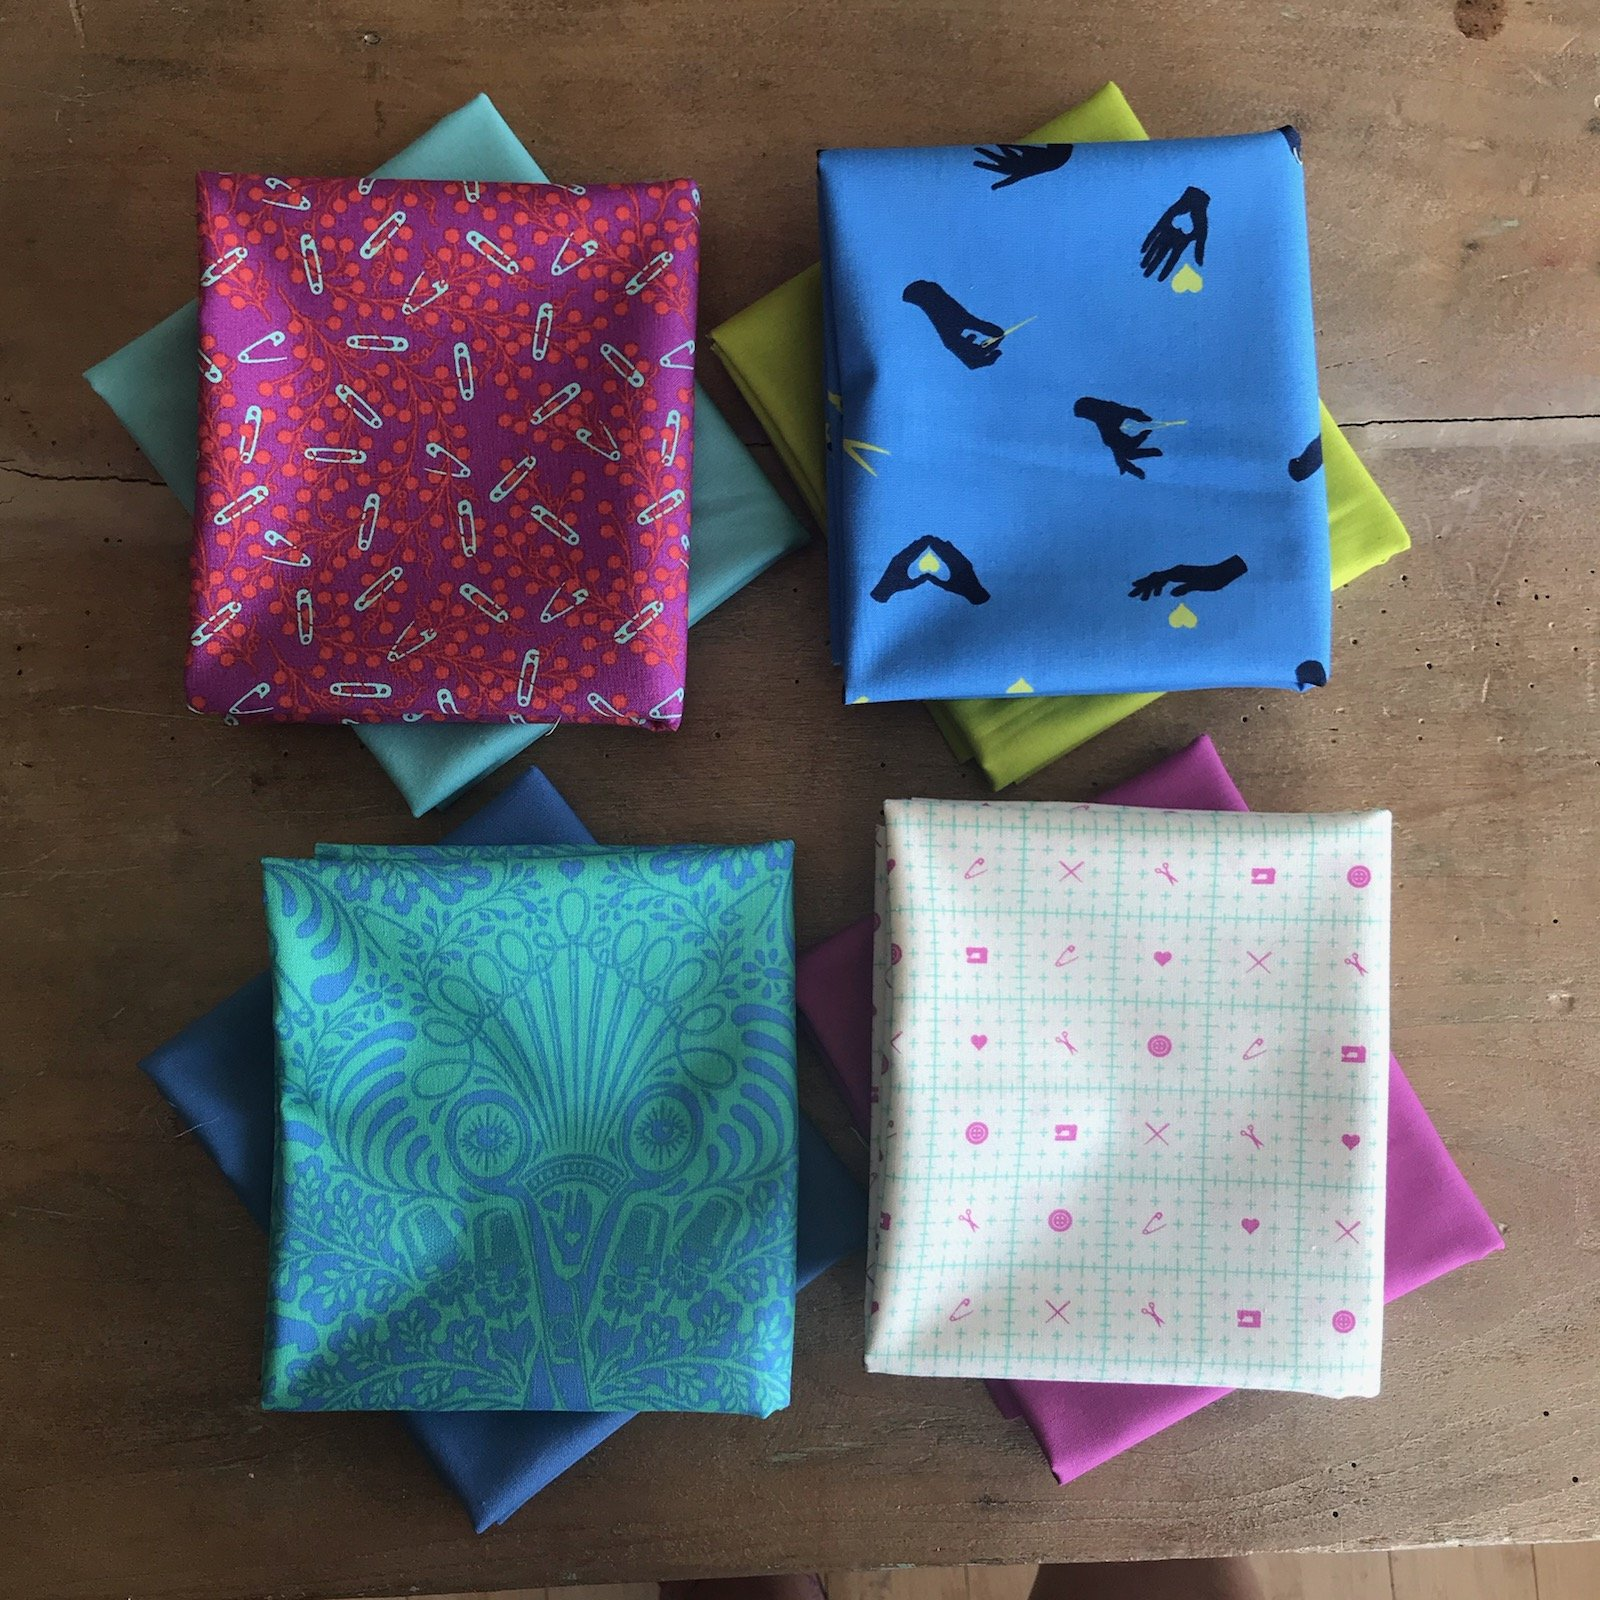 Mask making kits includes elastic CHOOSE FABRIC OPTIONS